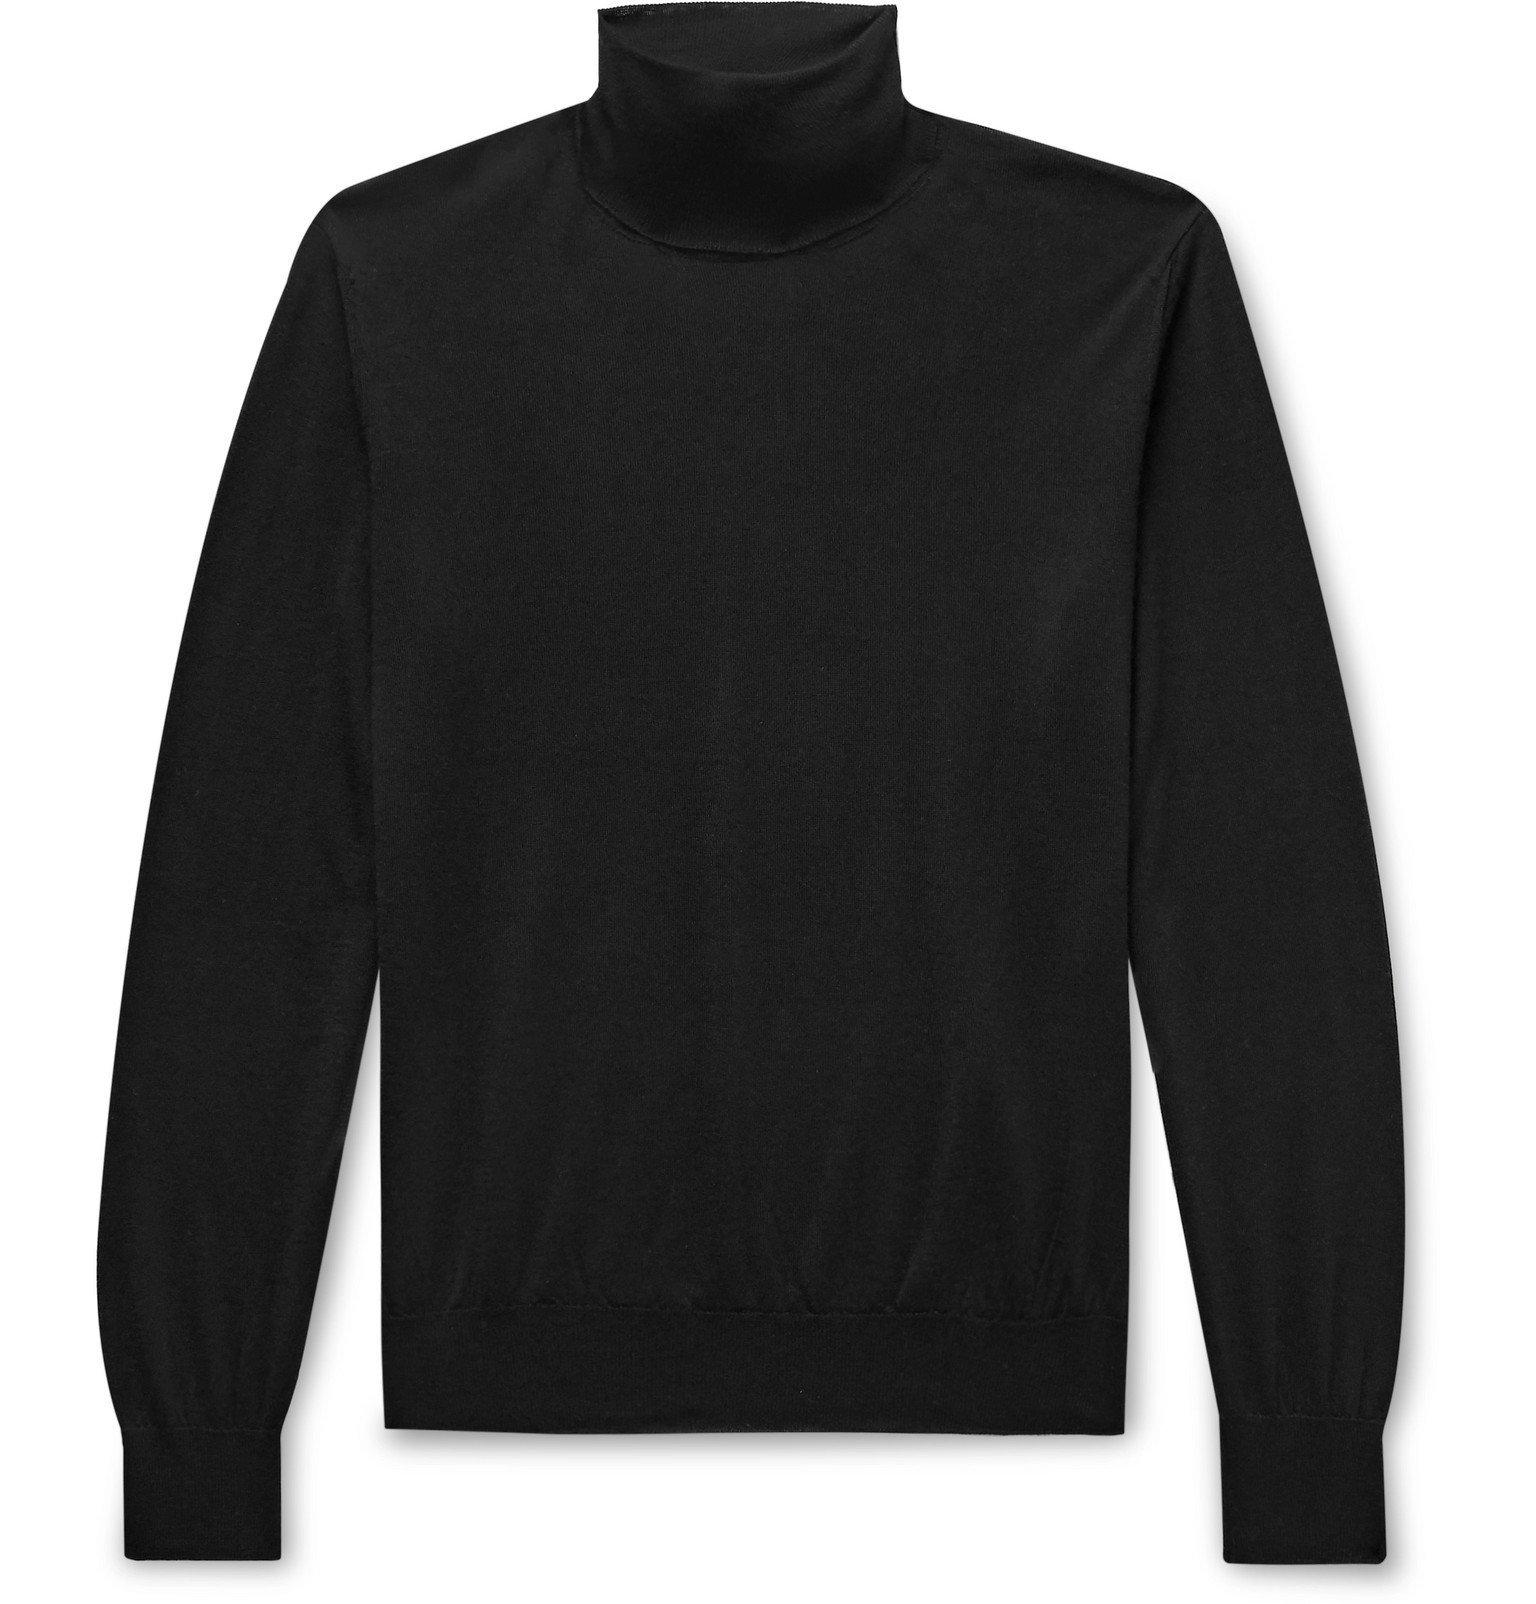 Saman Amel - Cashmere and Silk-Blend Rollneck Sweater - Black